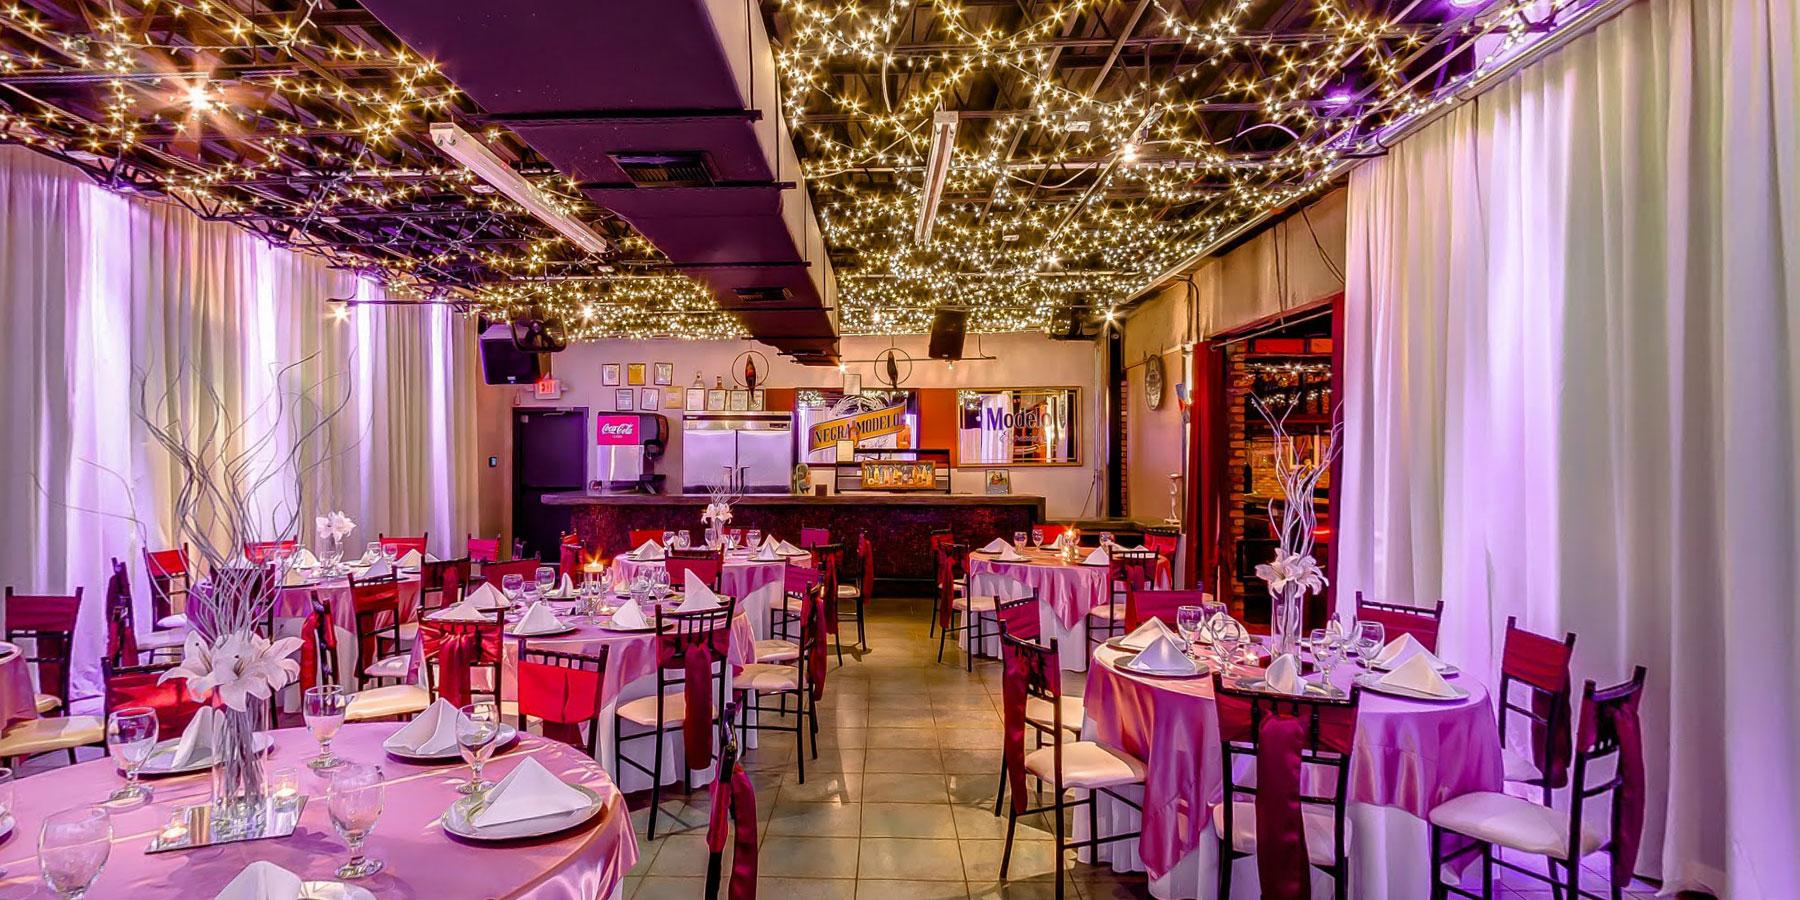 Hobby Event Center 9906 Gulf Fwy, Houston, TX 77034 - YP.com